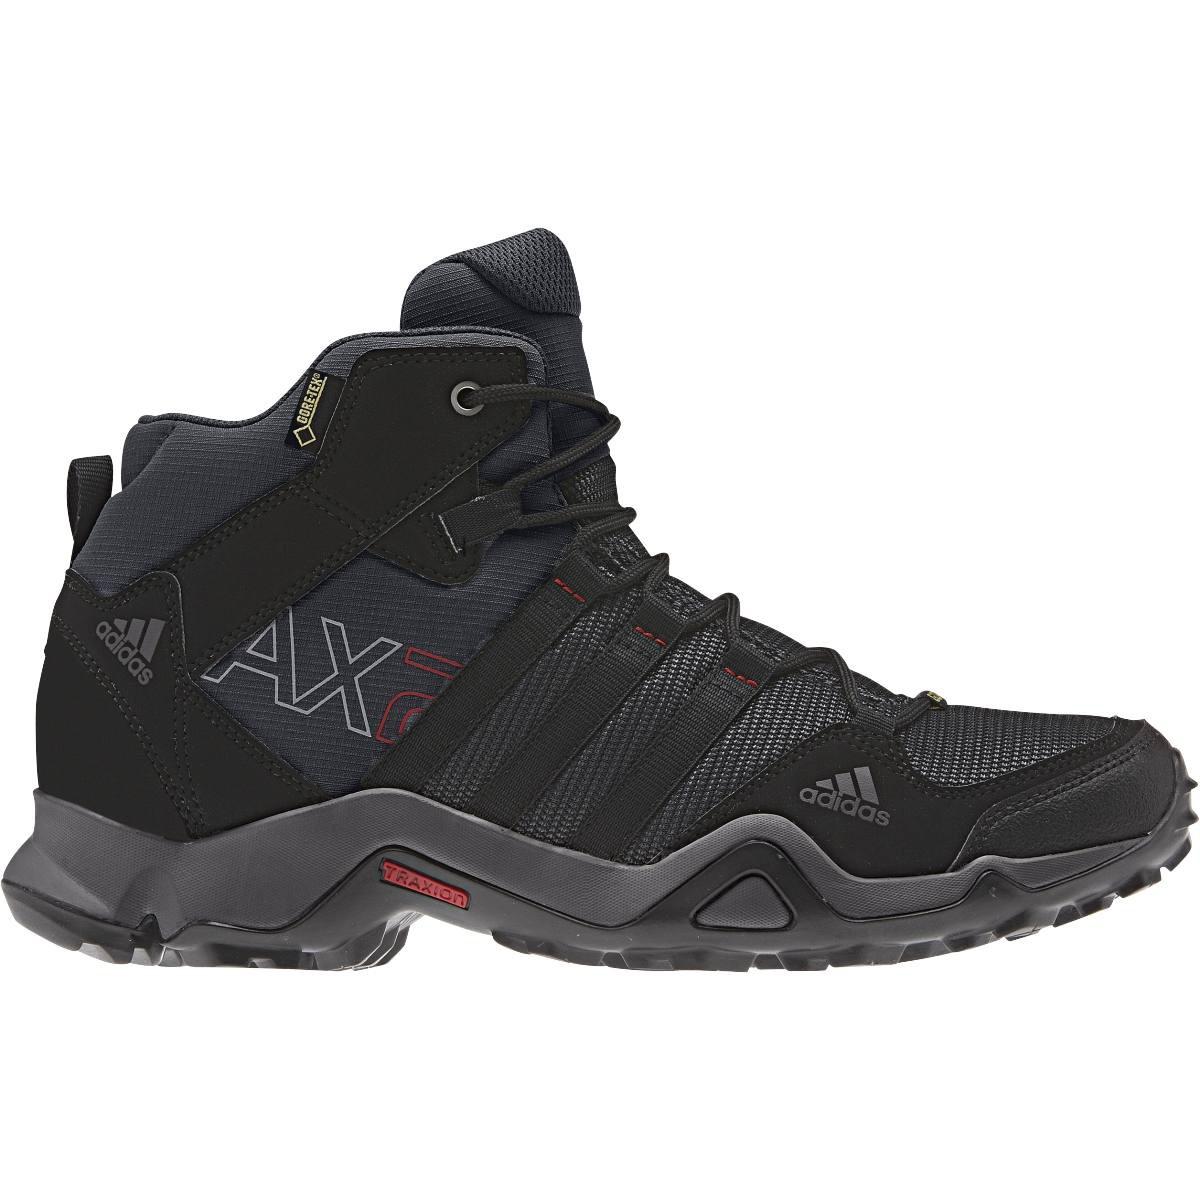 96abb11865 Pánská treková obuv adidas Performance AX2 MID GTX